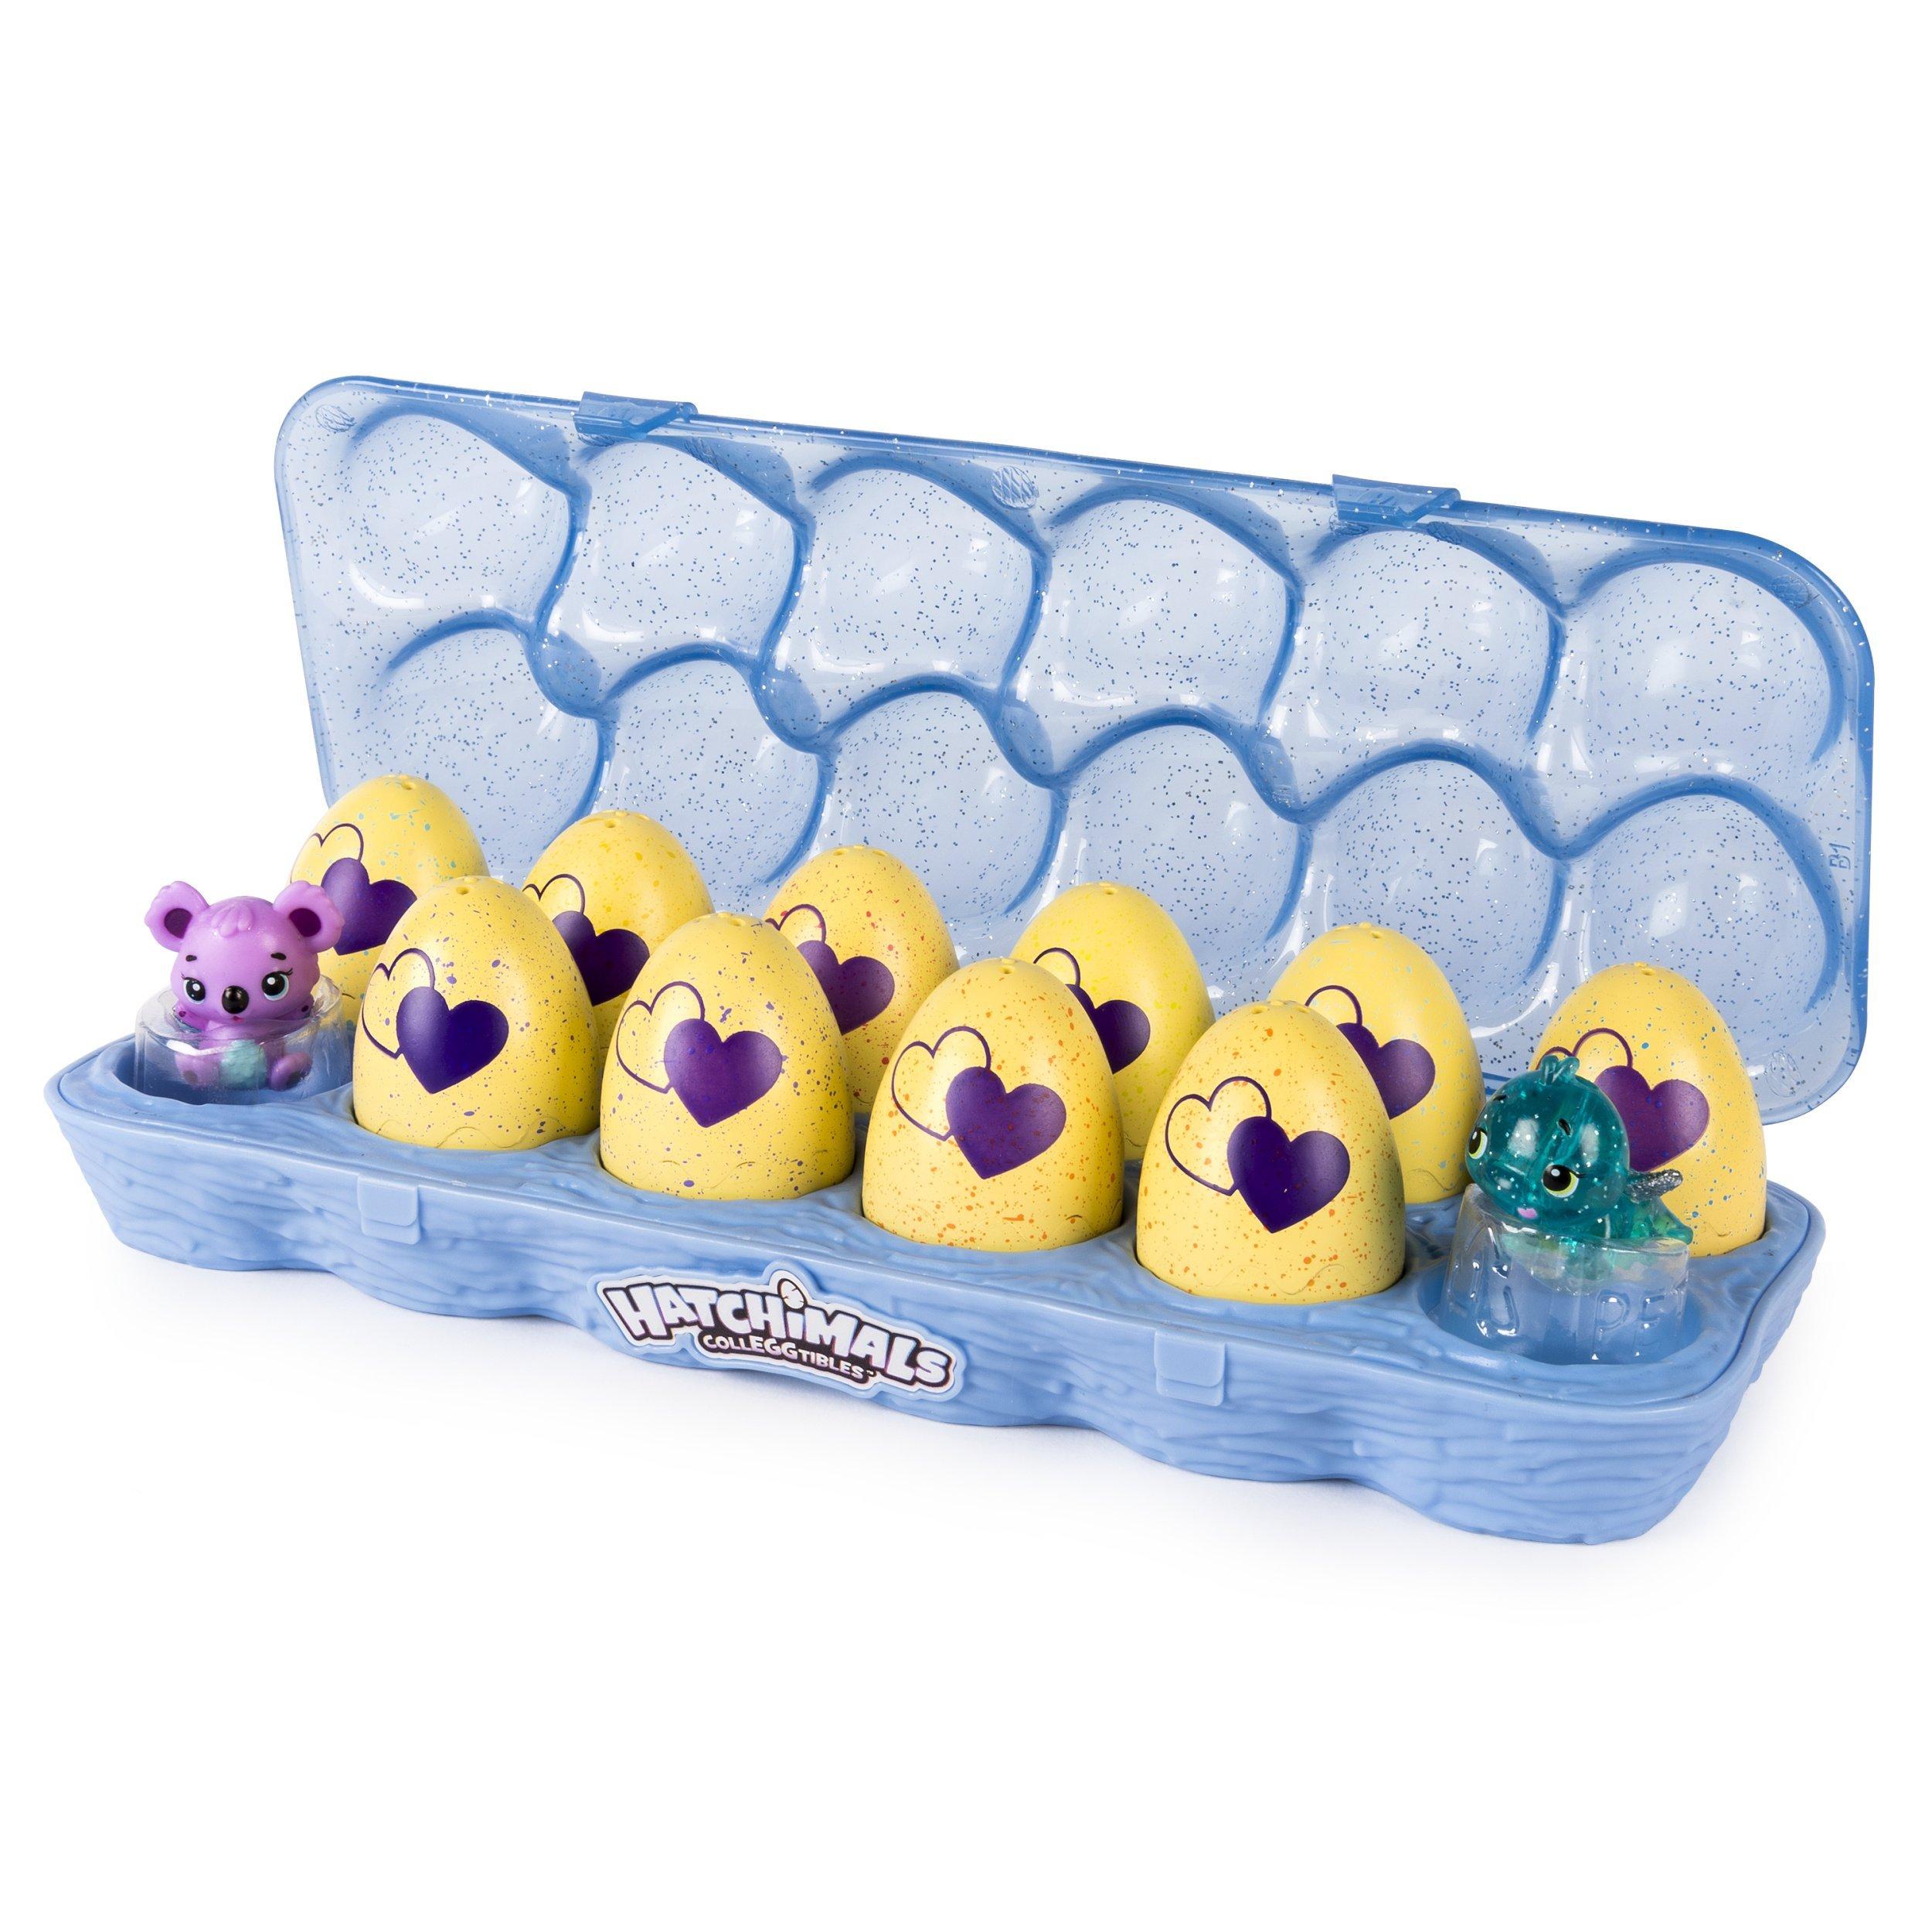 Hatchimals Colleggtibles 12 Pack Egg Carton Season 1